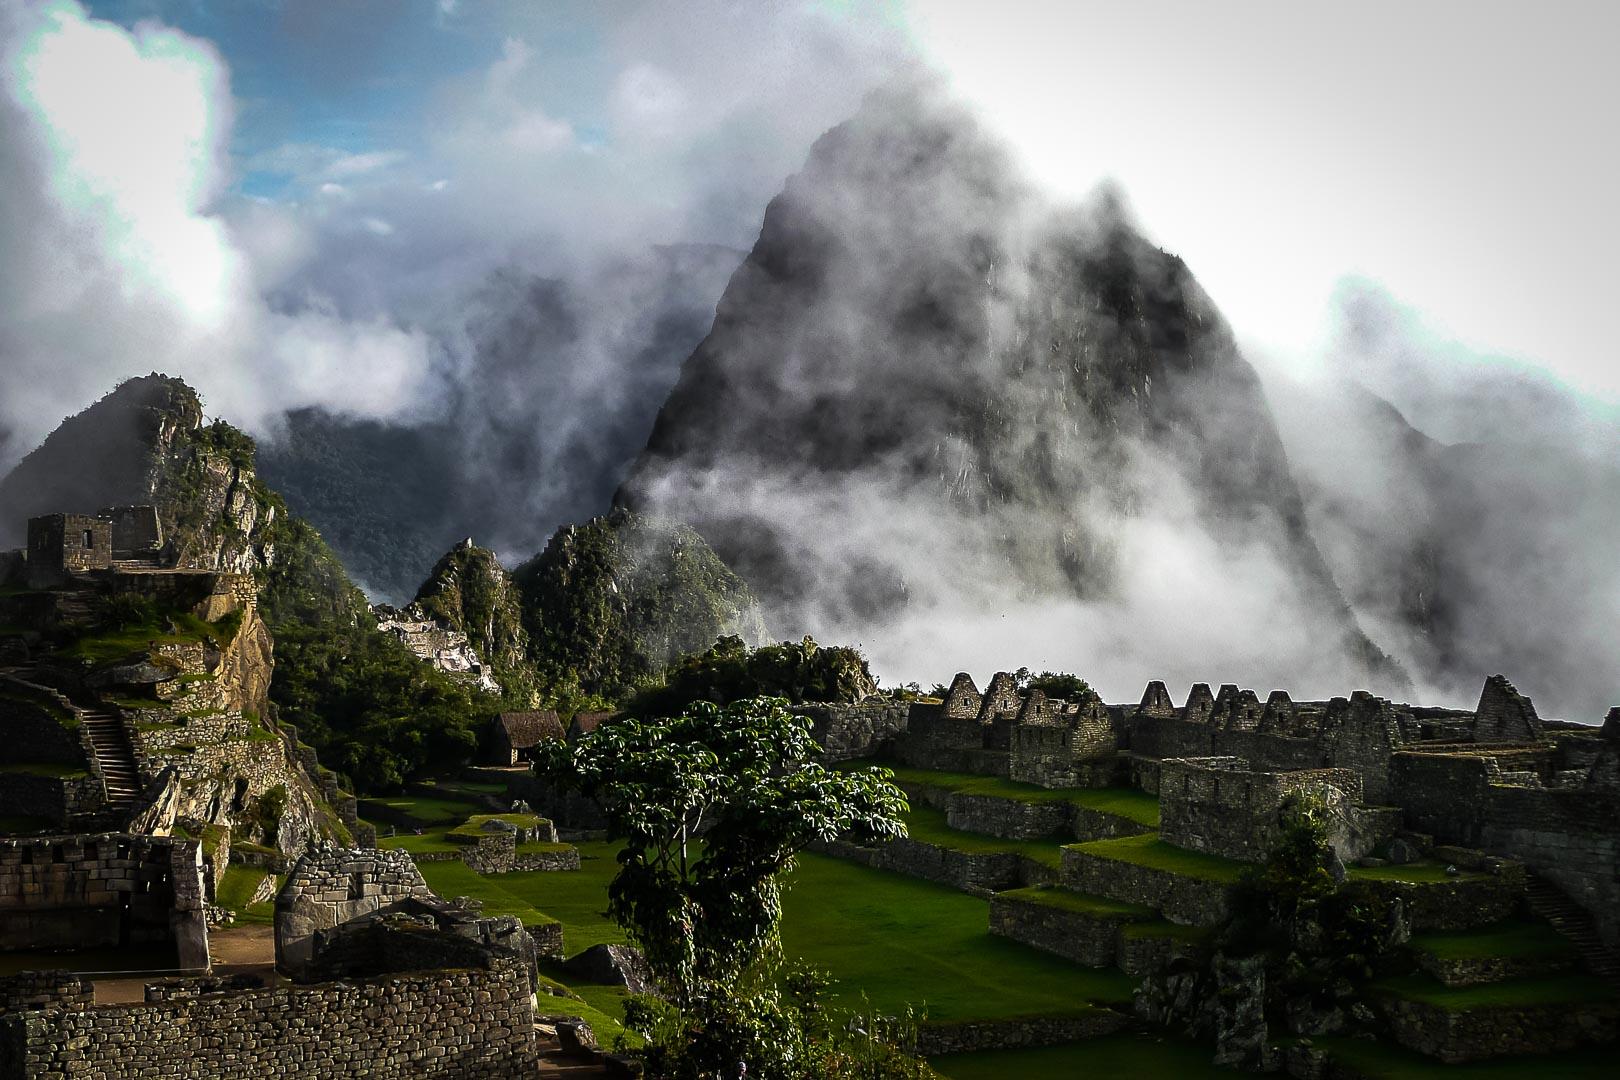 Machu Picchu - Breathtaking views